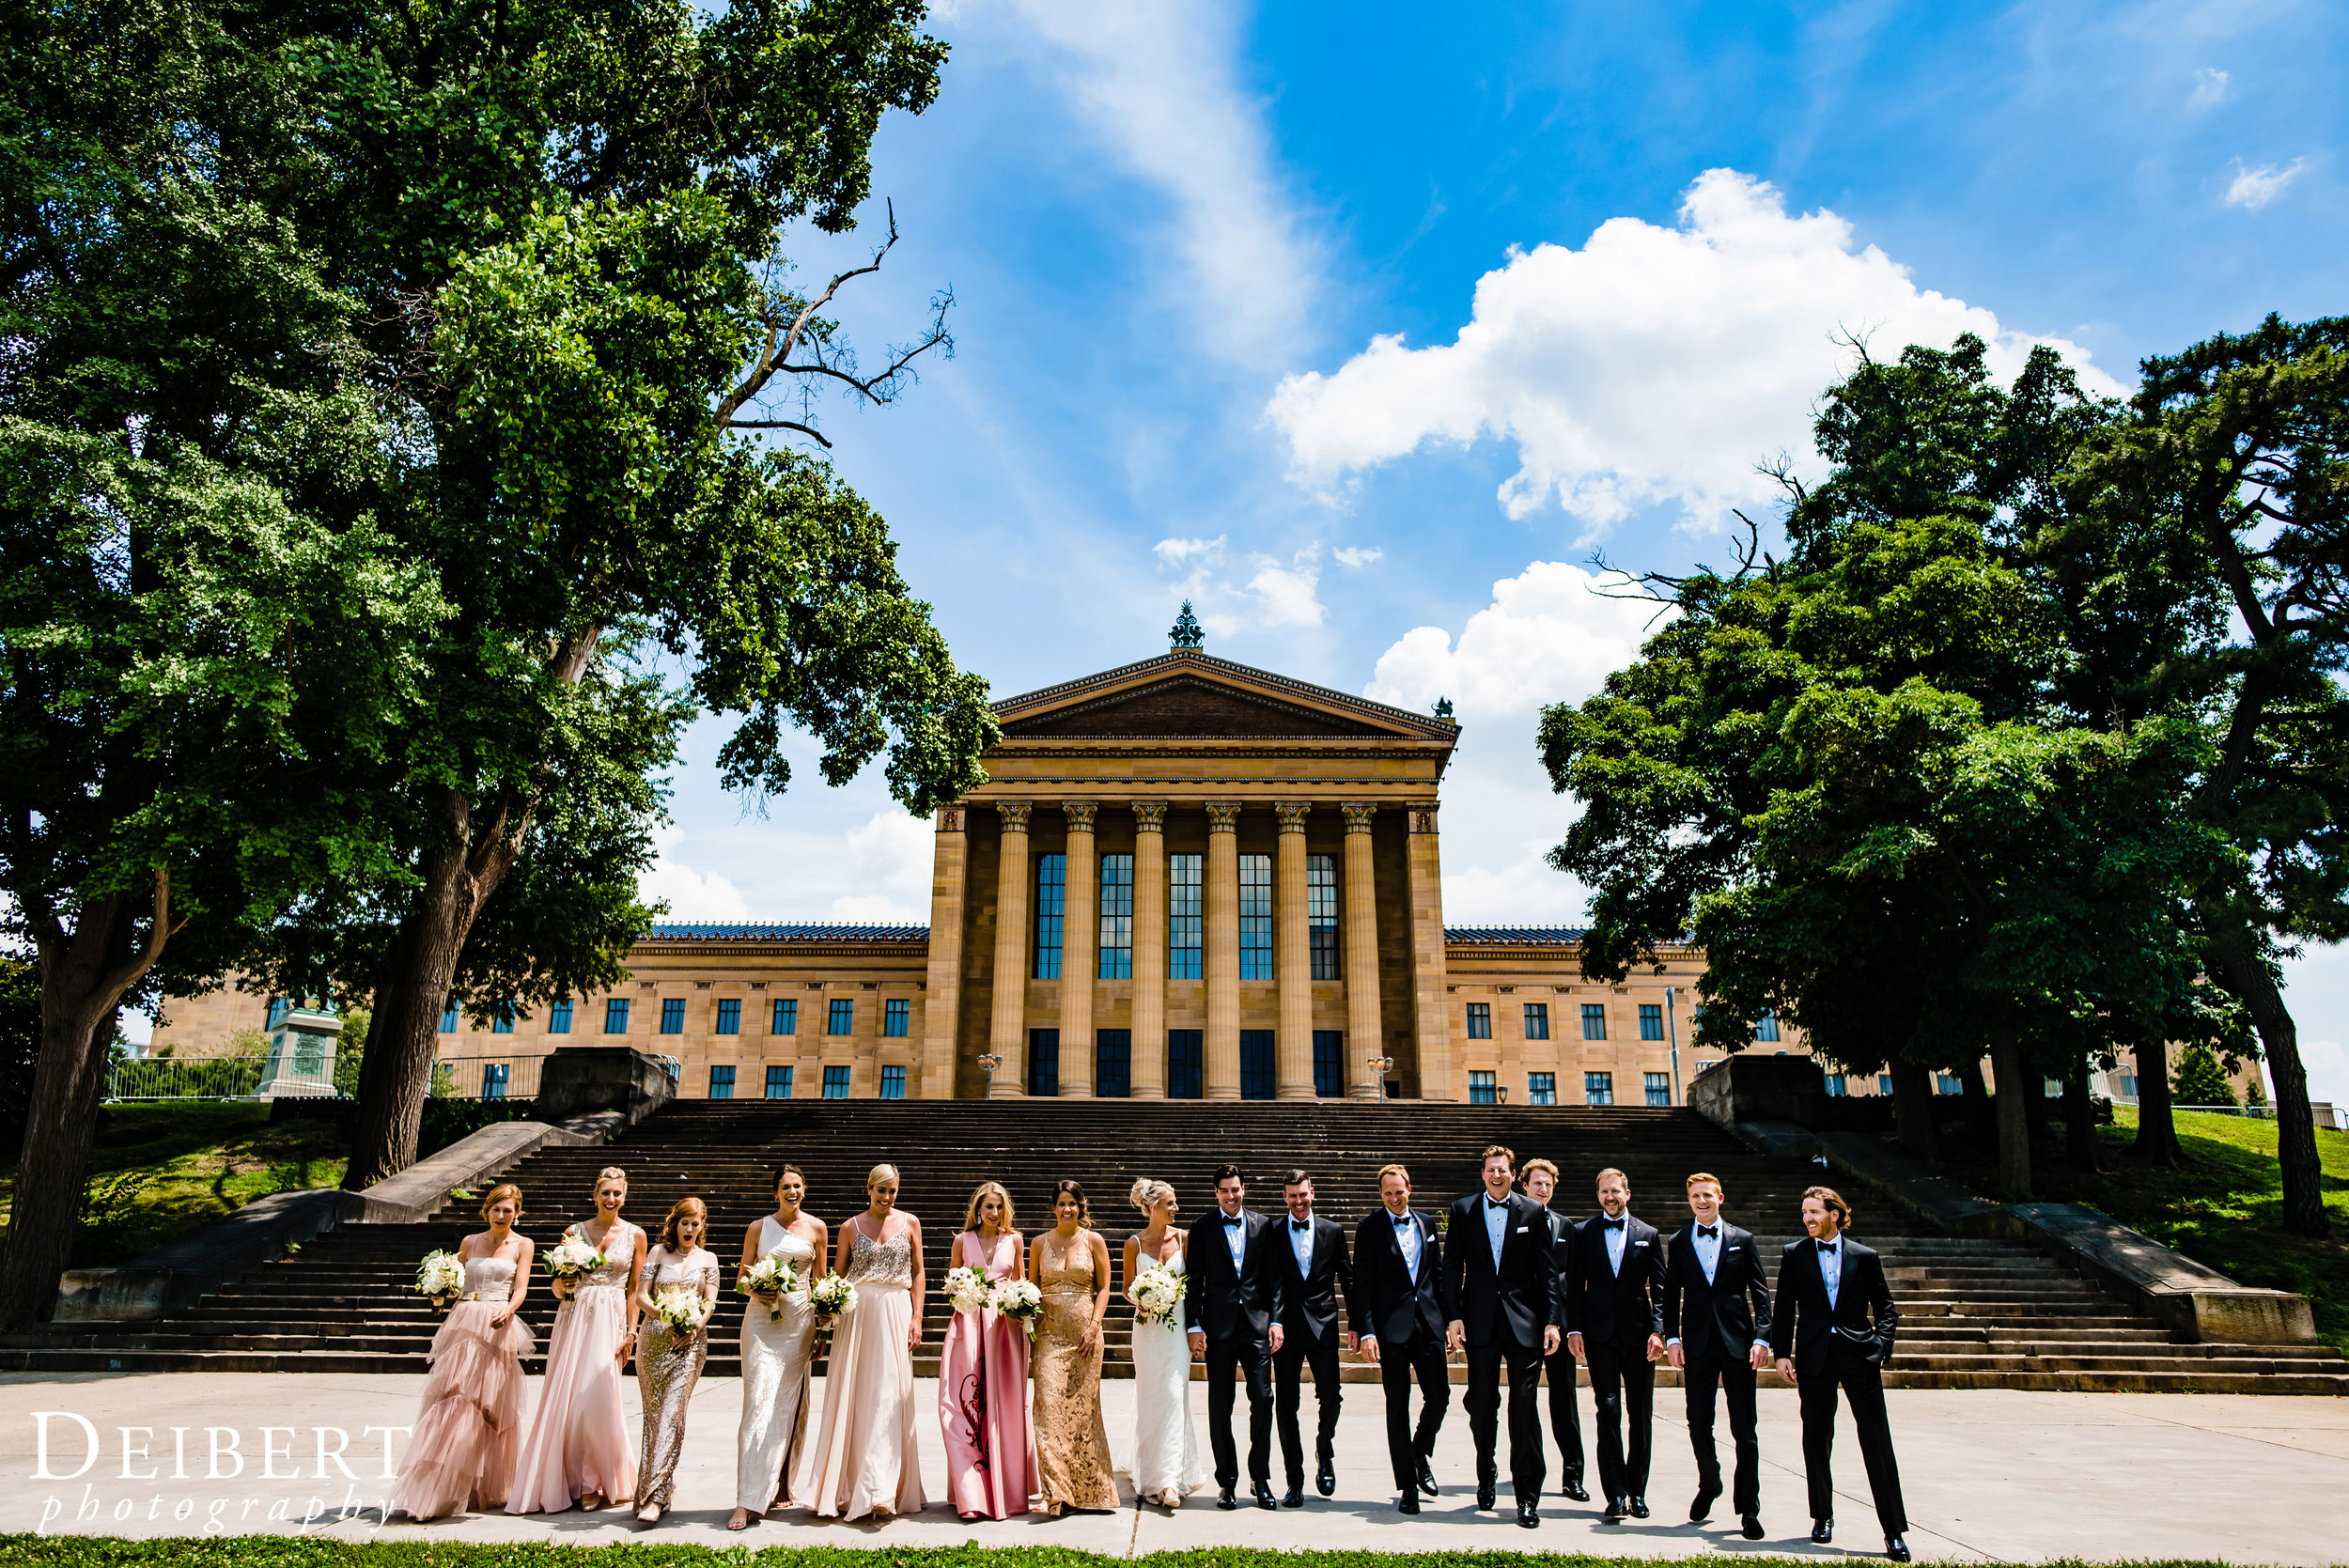 College_of_physicians_wedding-3.jpg